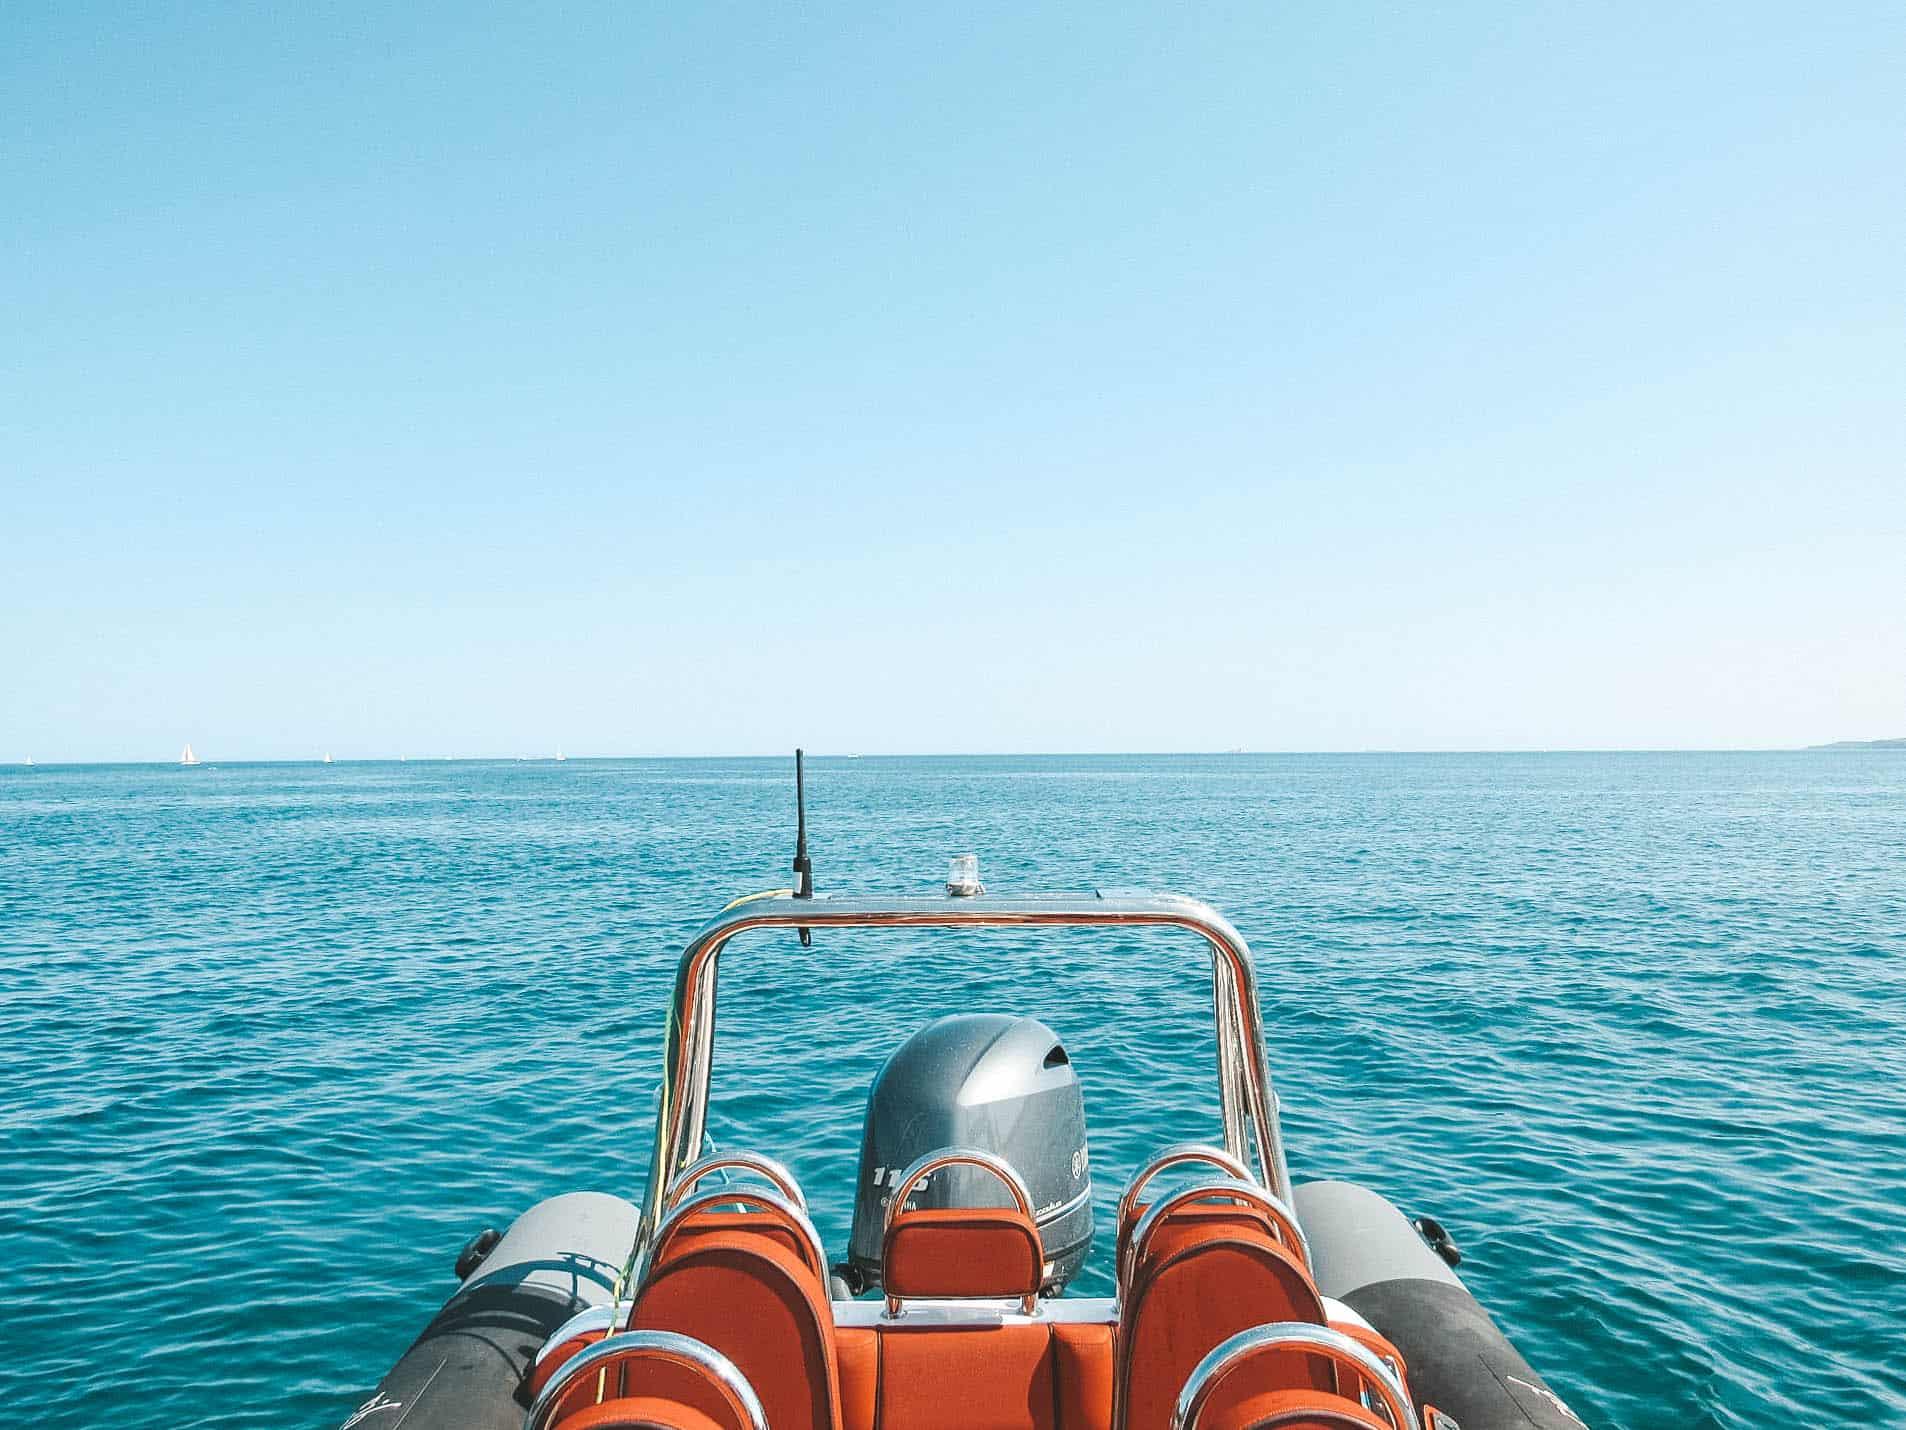 falmouth-rib-charters-greenbank-hotel-cornwall-adventures